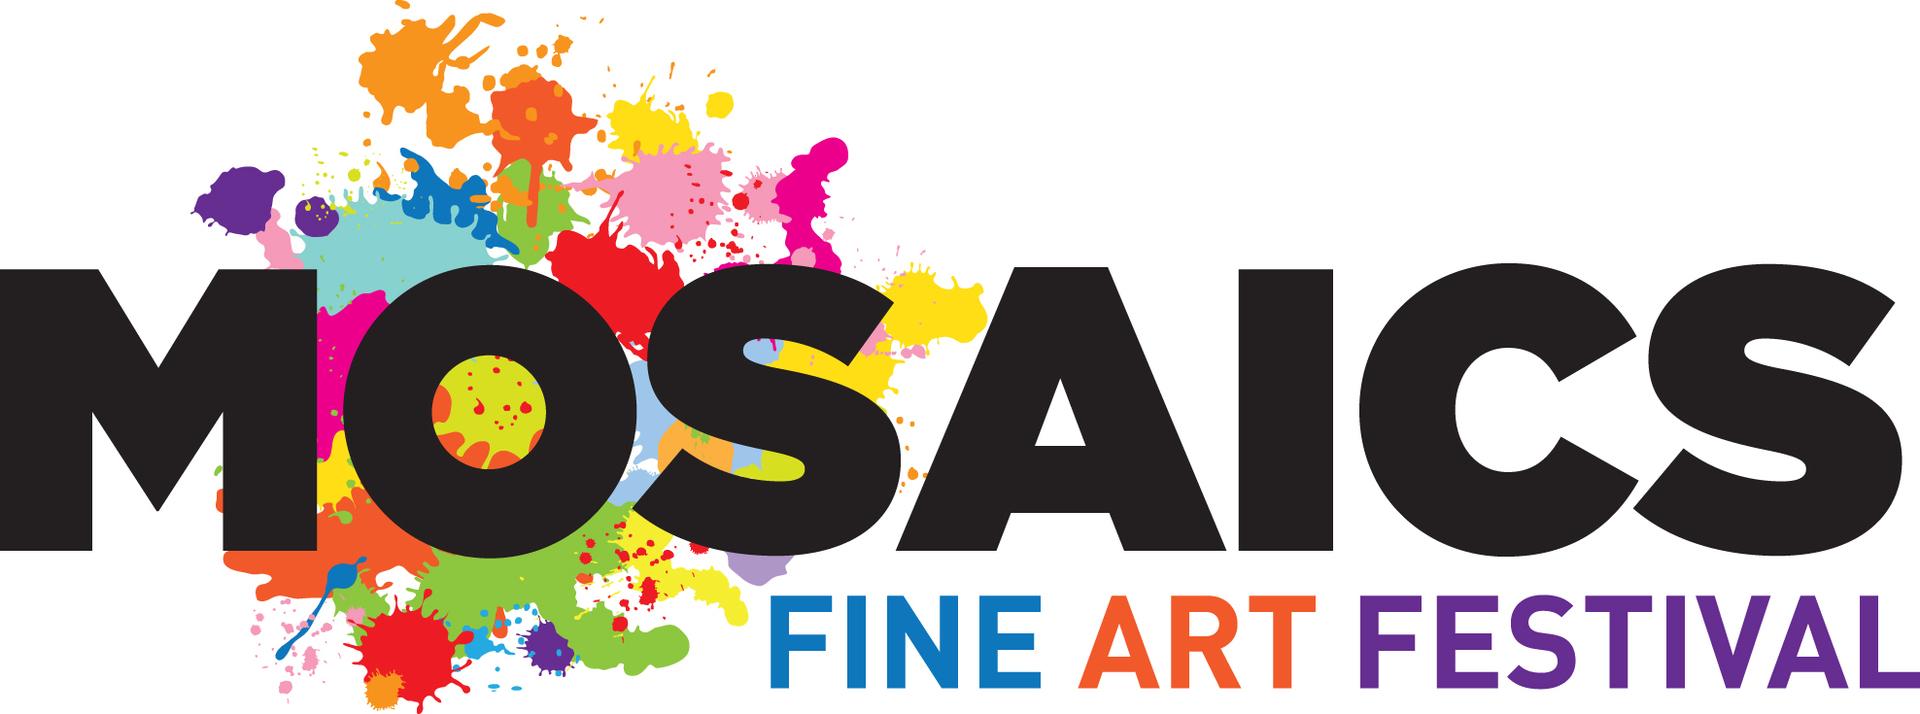 Mosaics Fine Art Festival's 26th Annual Event